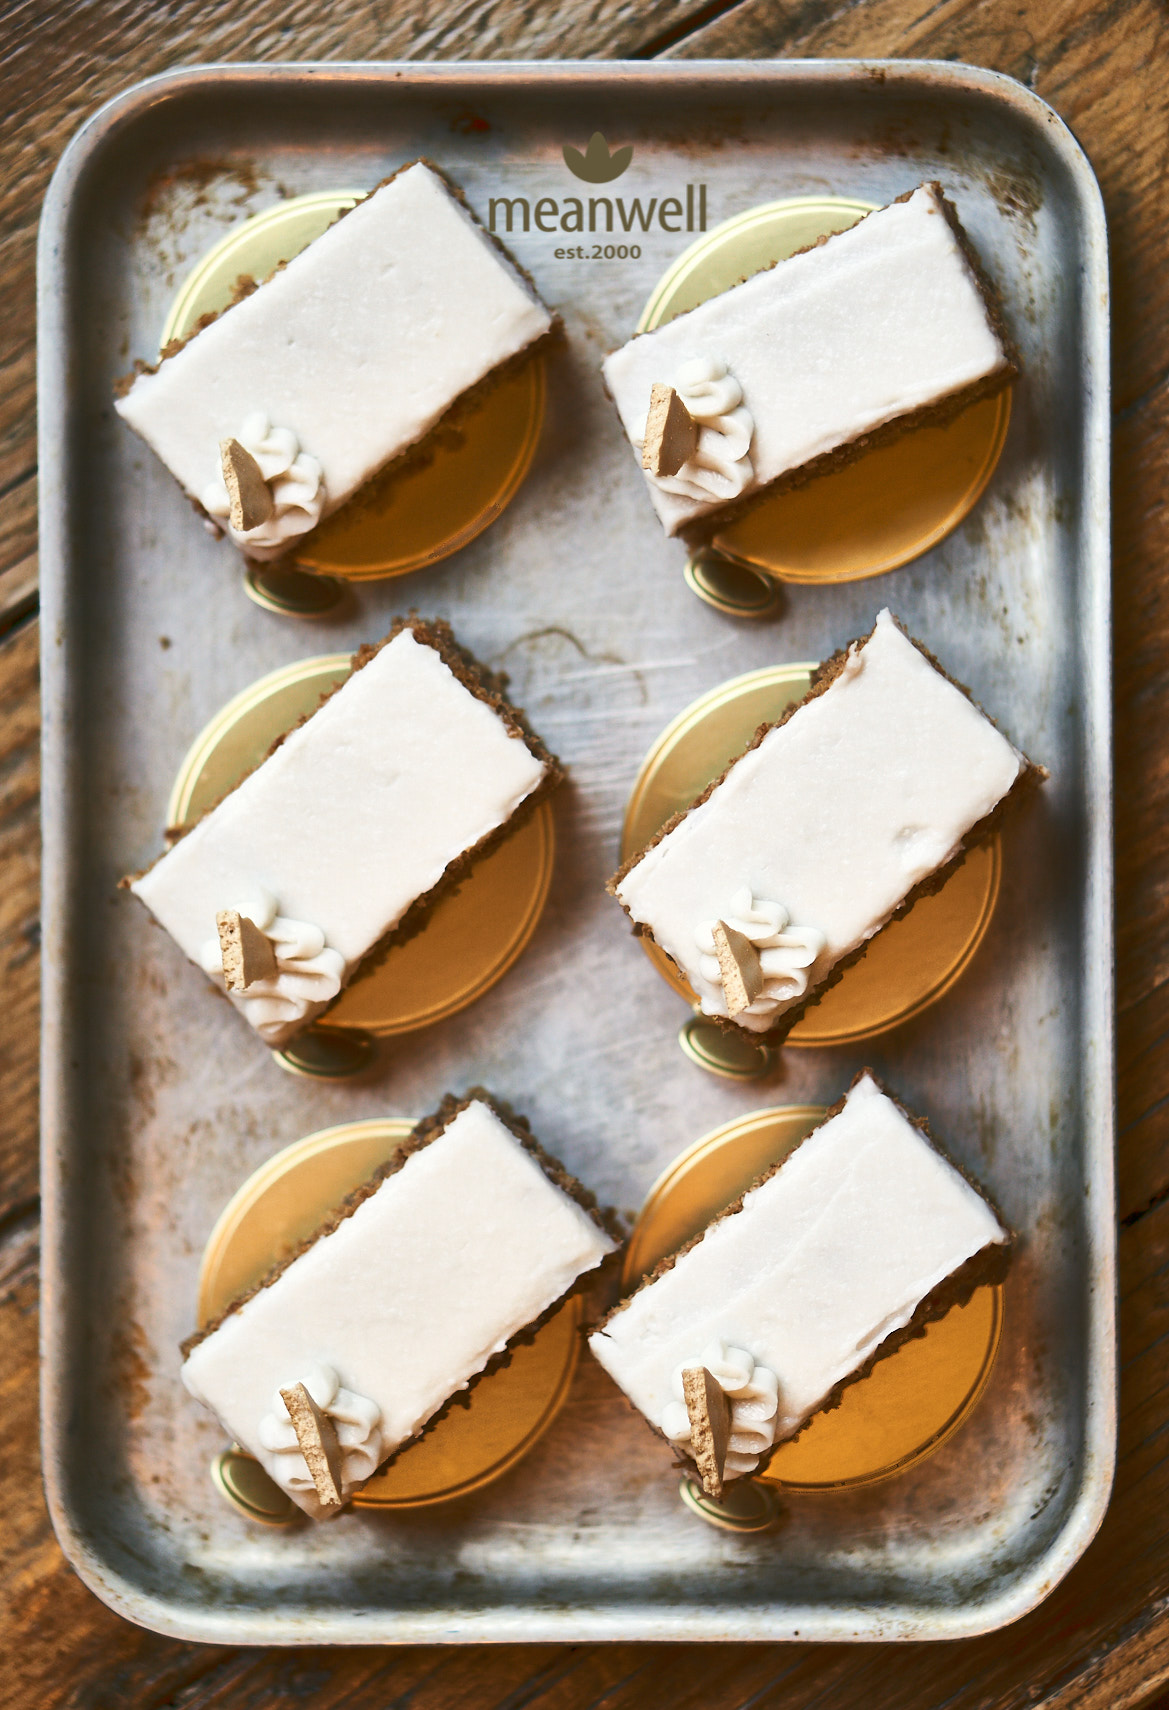 Scones Food photography by VA